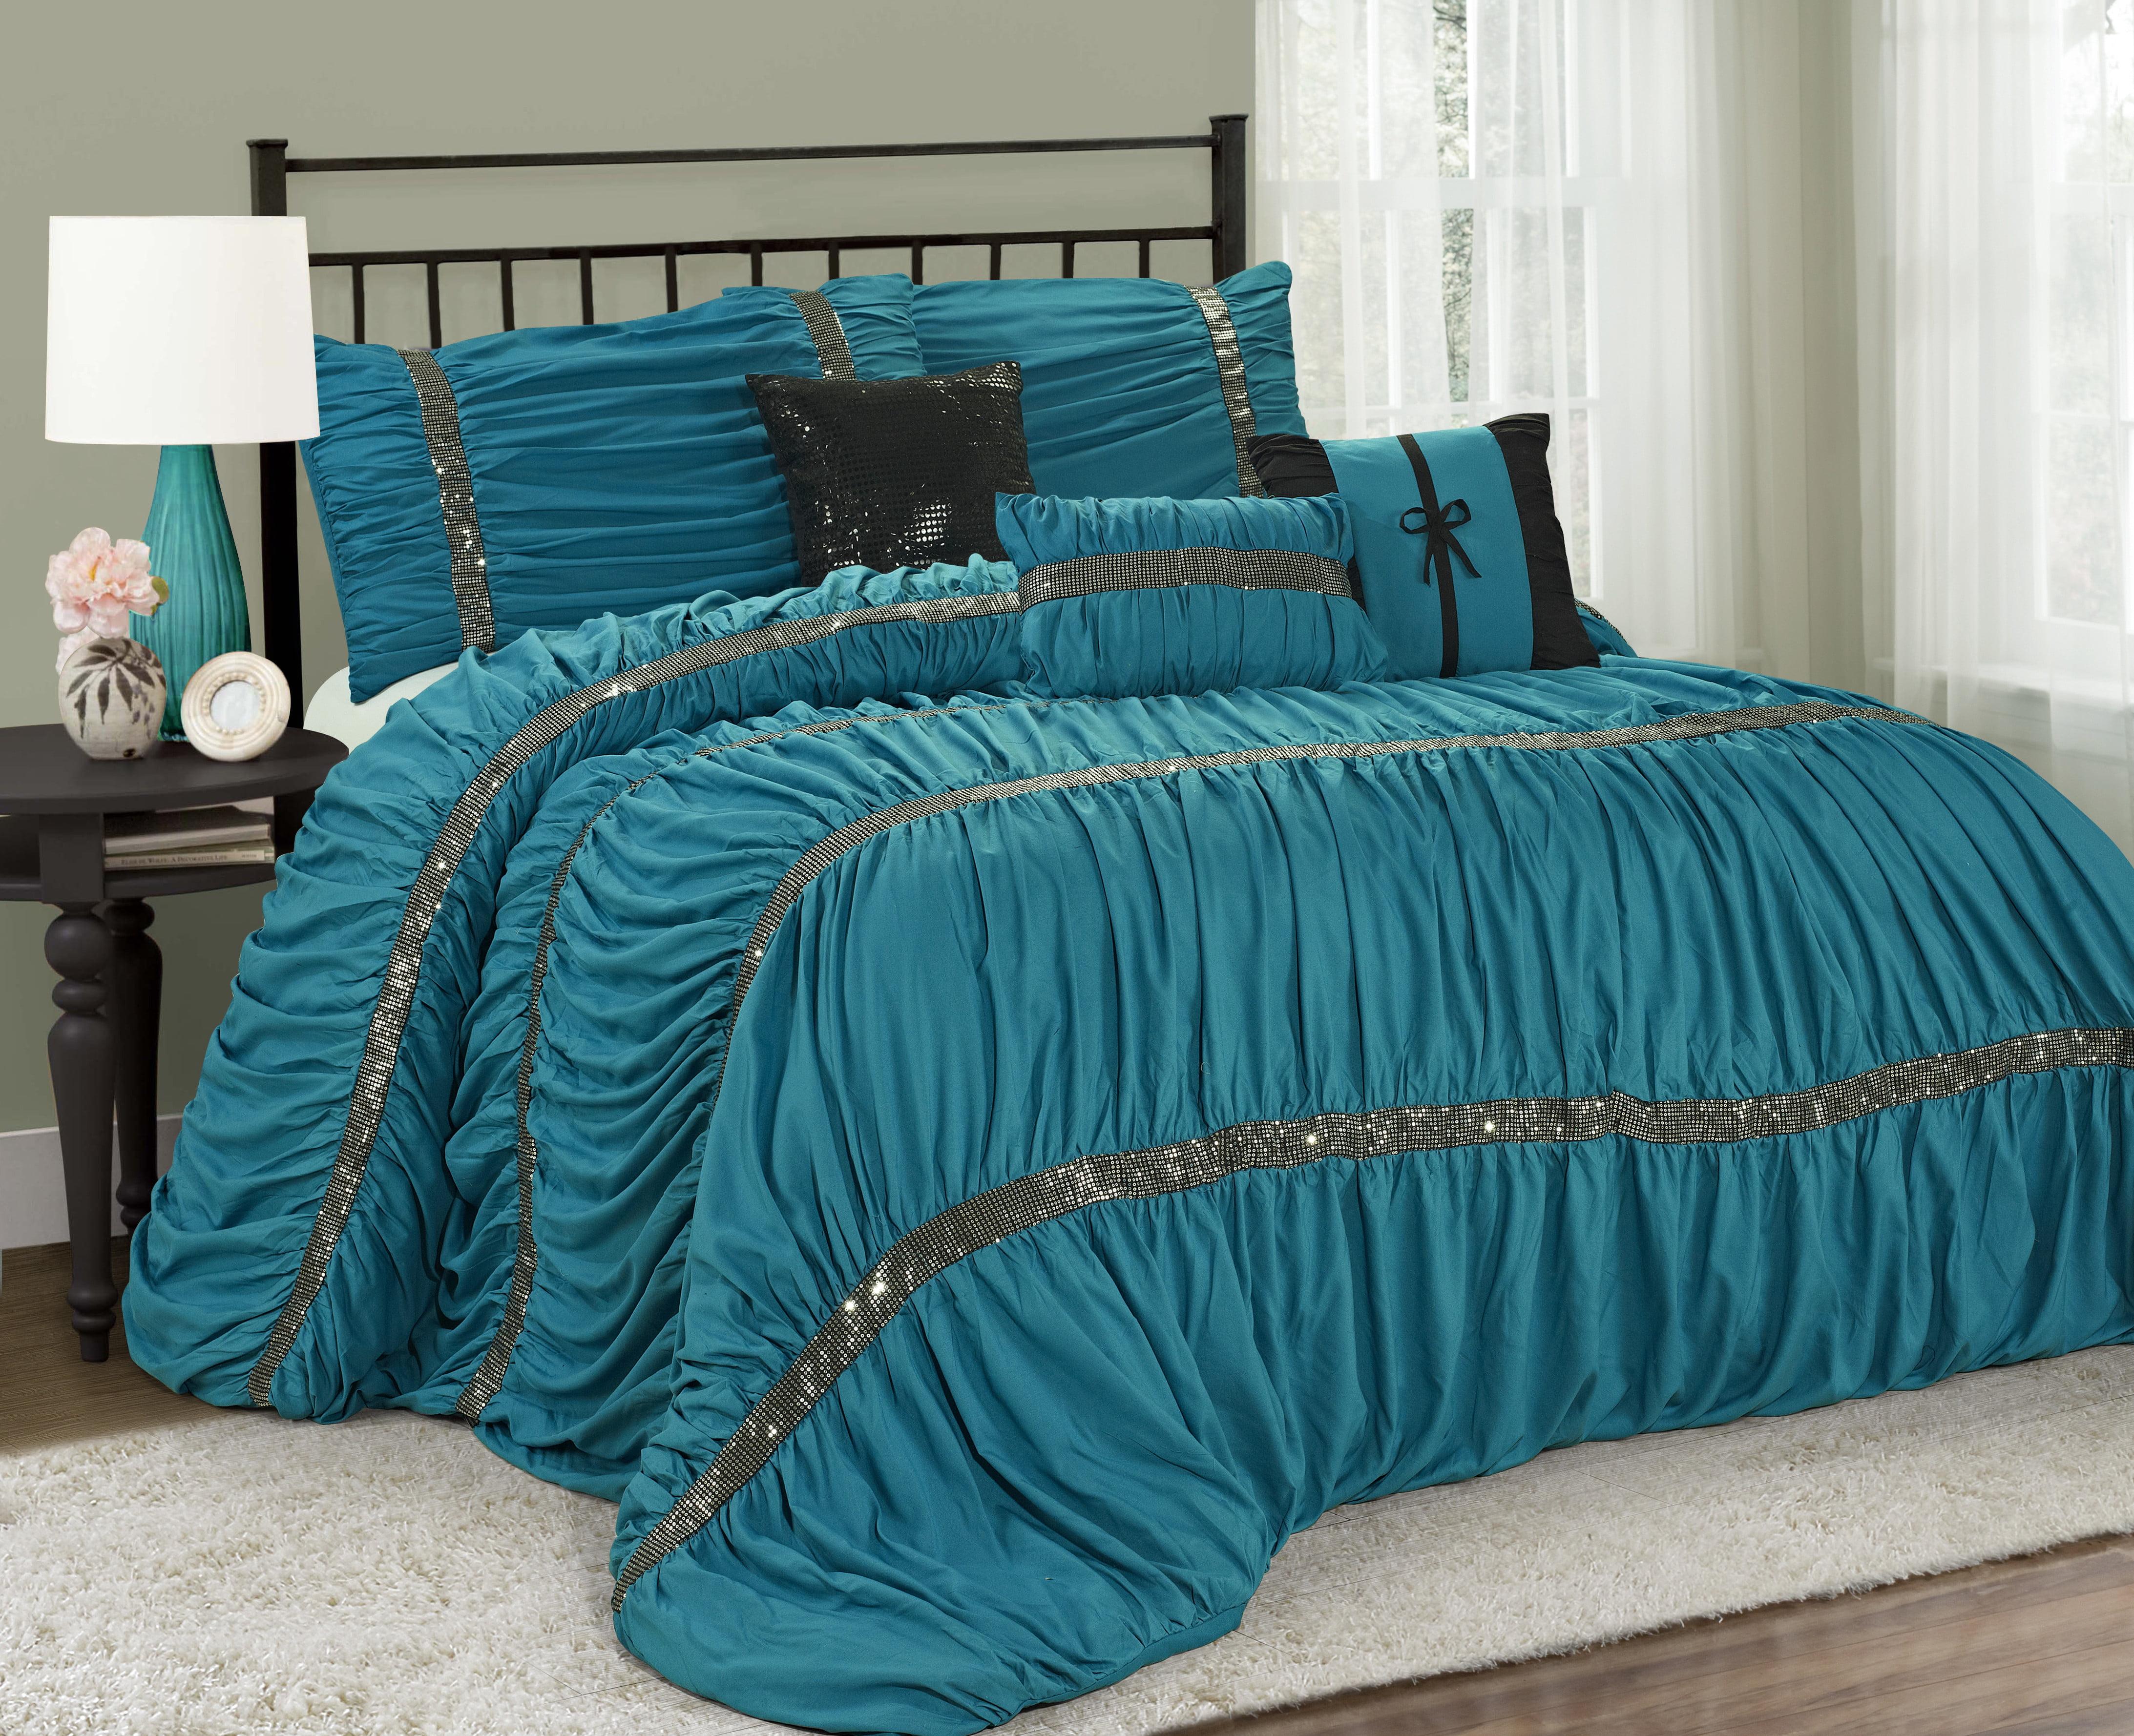 Mallen Home 7 Piece Ruched Comforter Set With Sequin